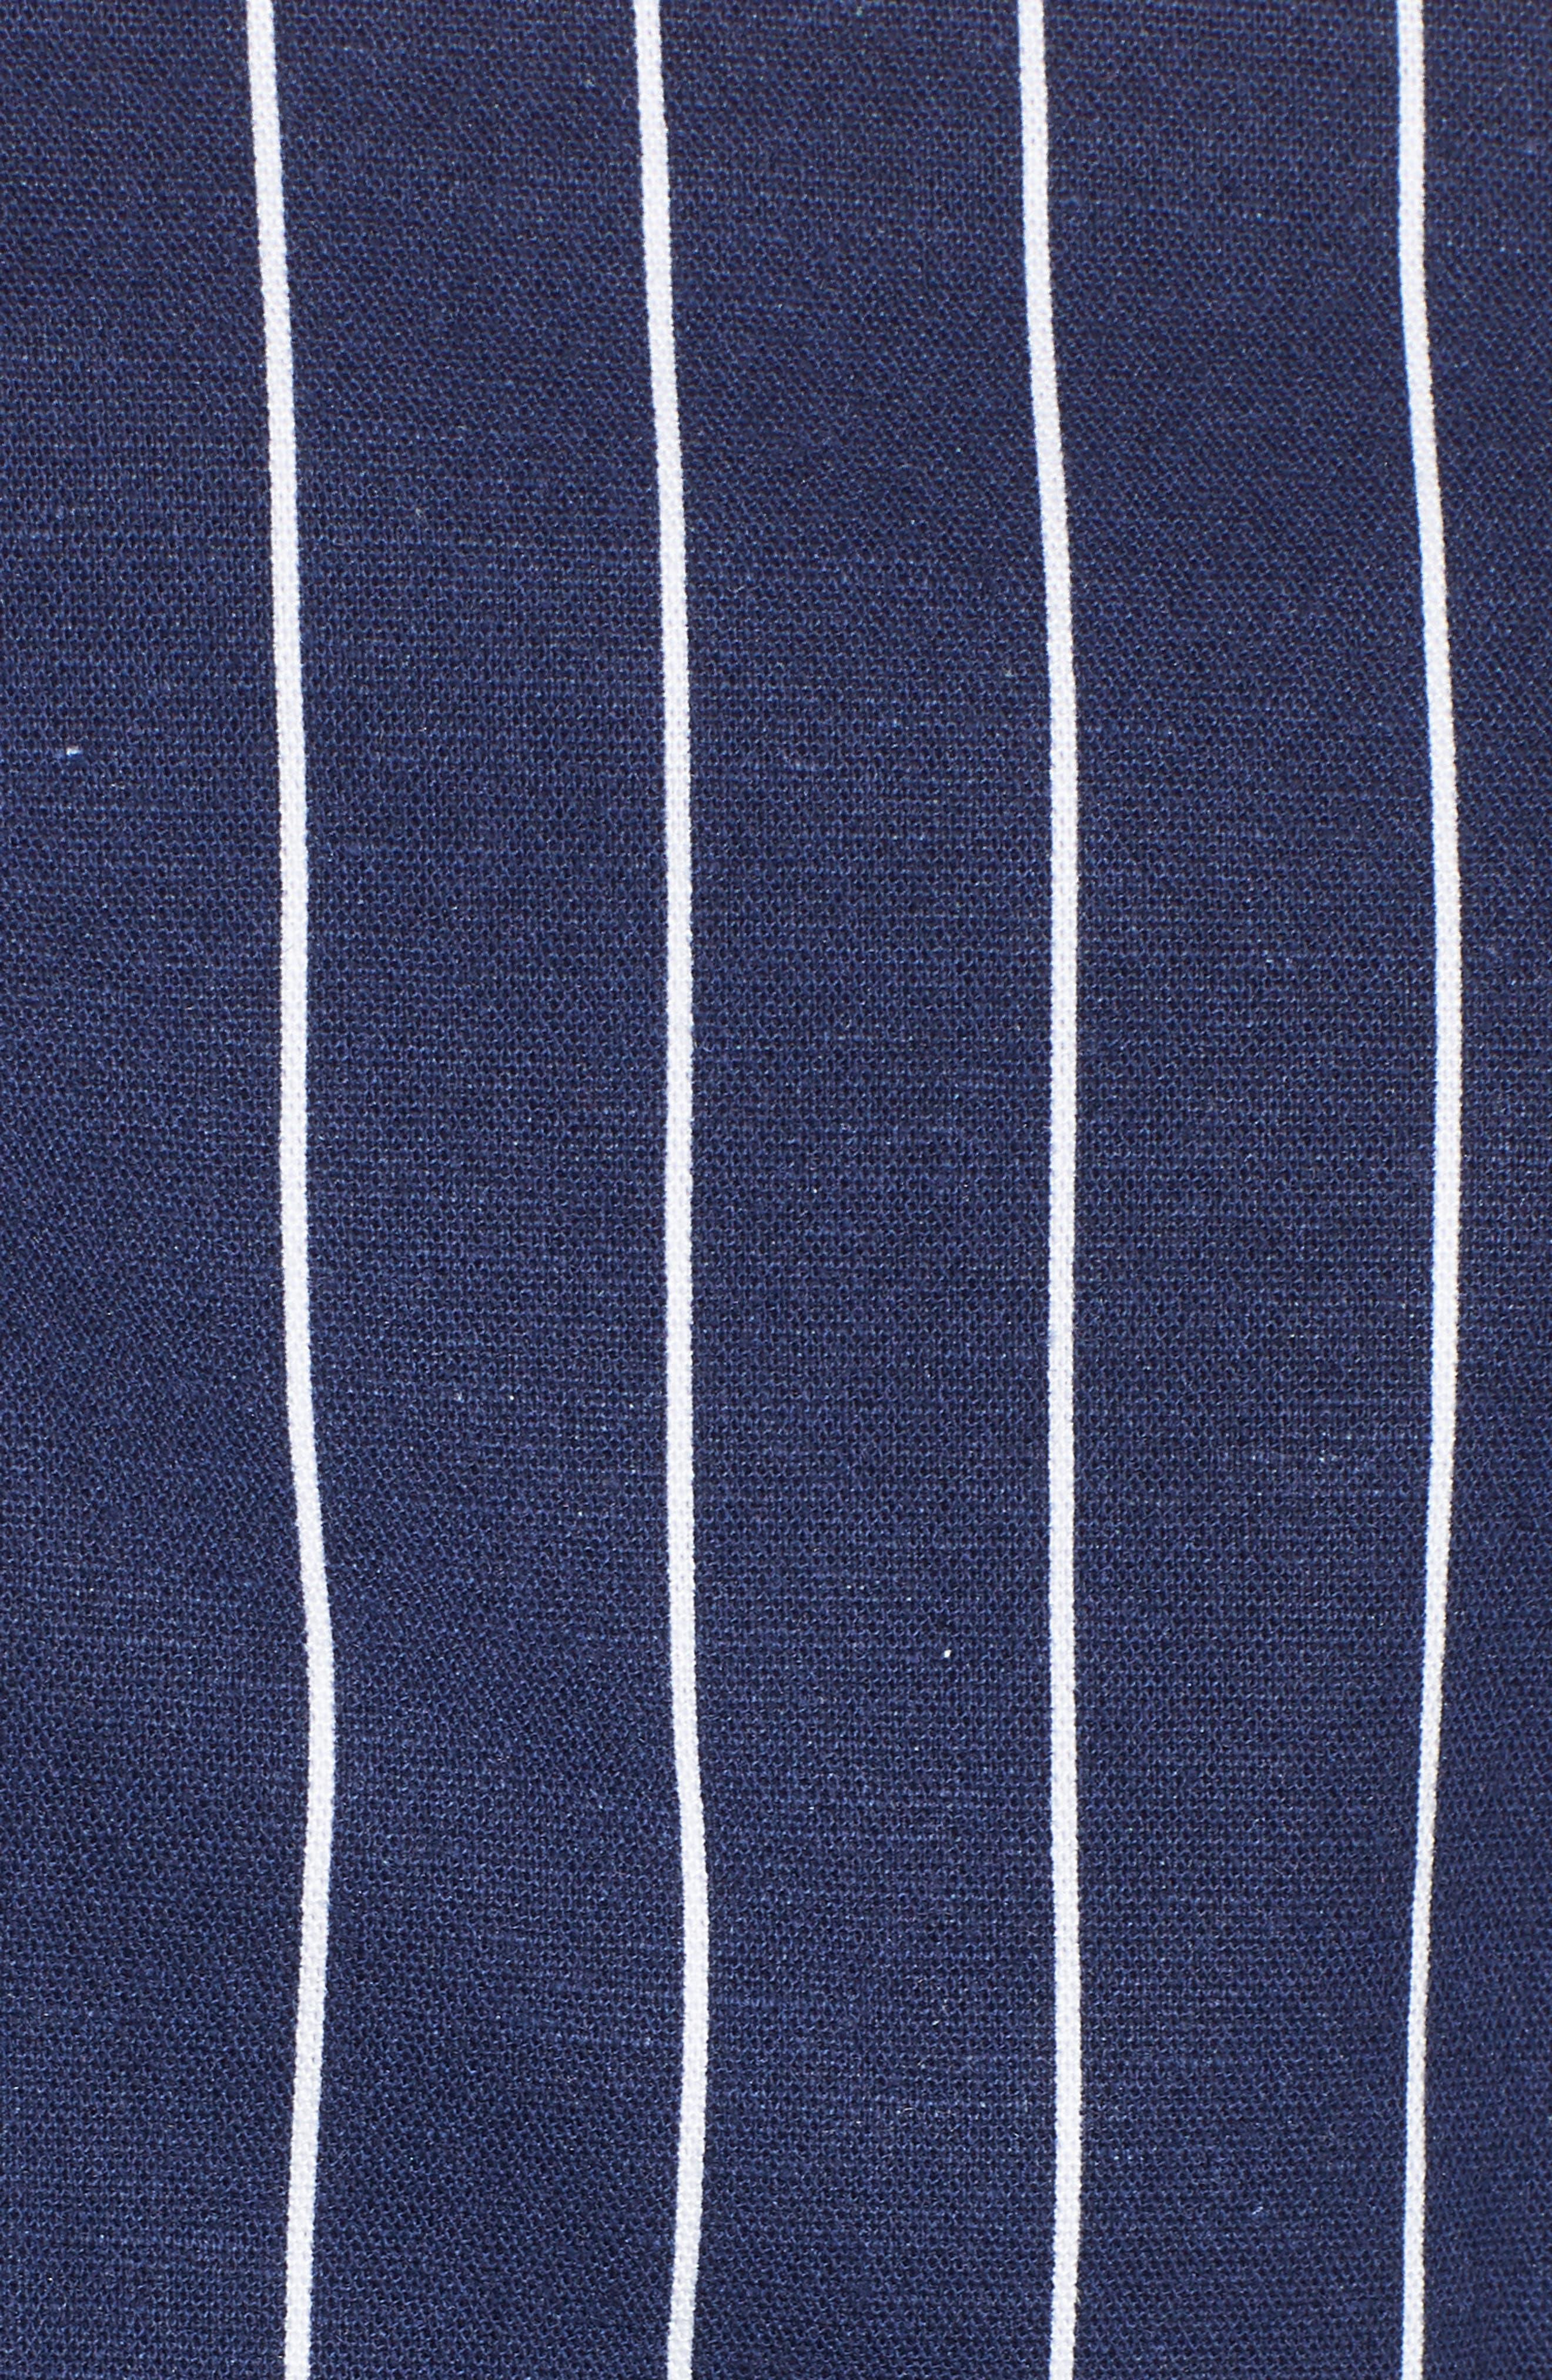 Kean Wrap Crop Top,                             Alternate thumbnail 6, color,                             Navy Stripe